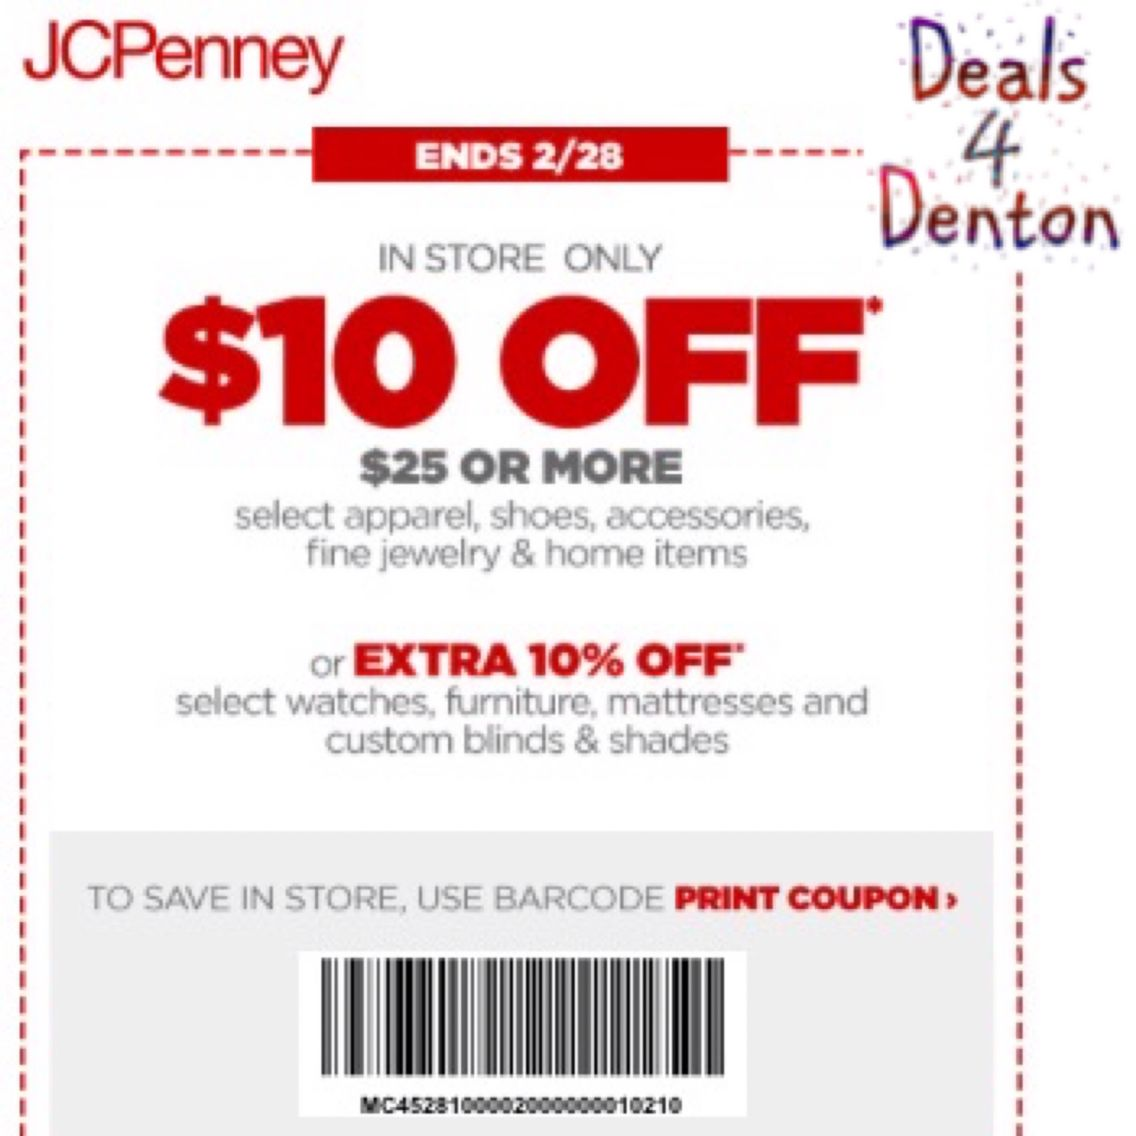 Couponcommunity Denton Shopping Jcpenney Target Coupons Free Printable Coupons Printable Coupons